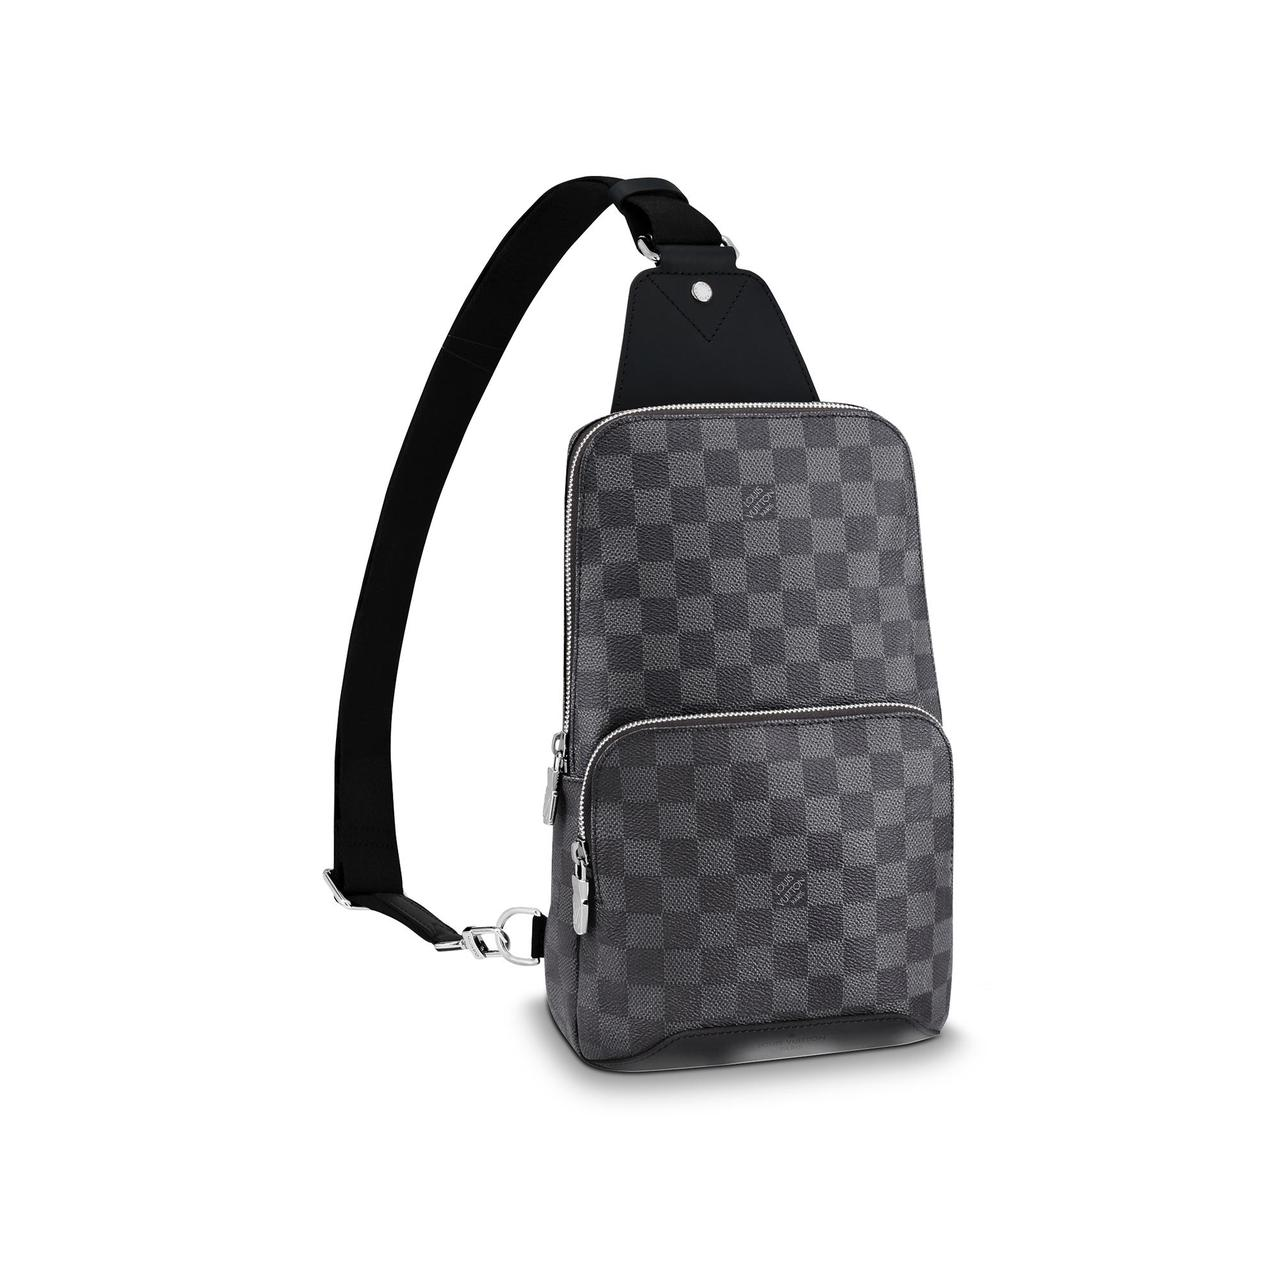 Слинг сумка Louis Vuitton Avenue 19842 серо-черная